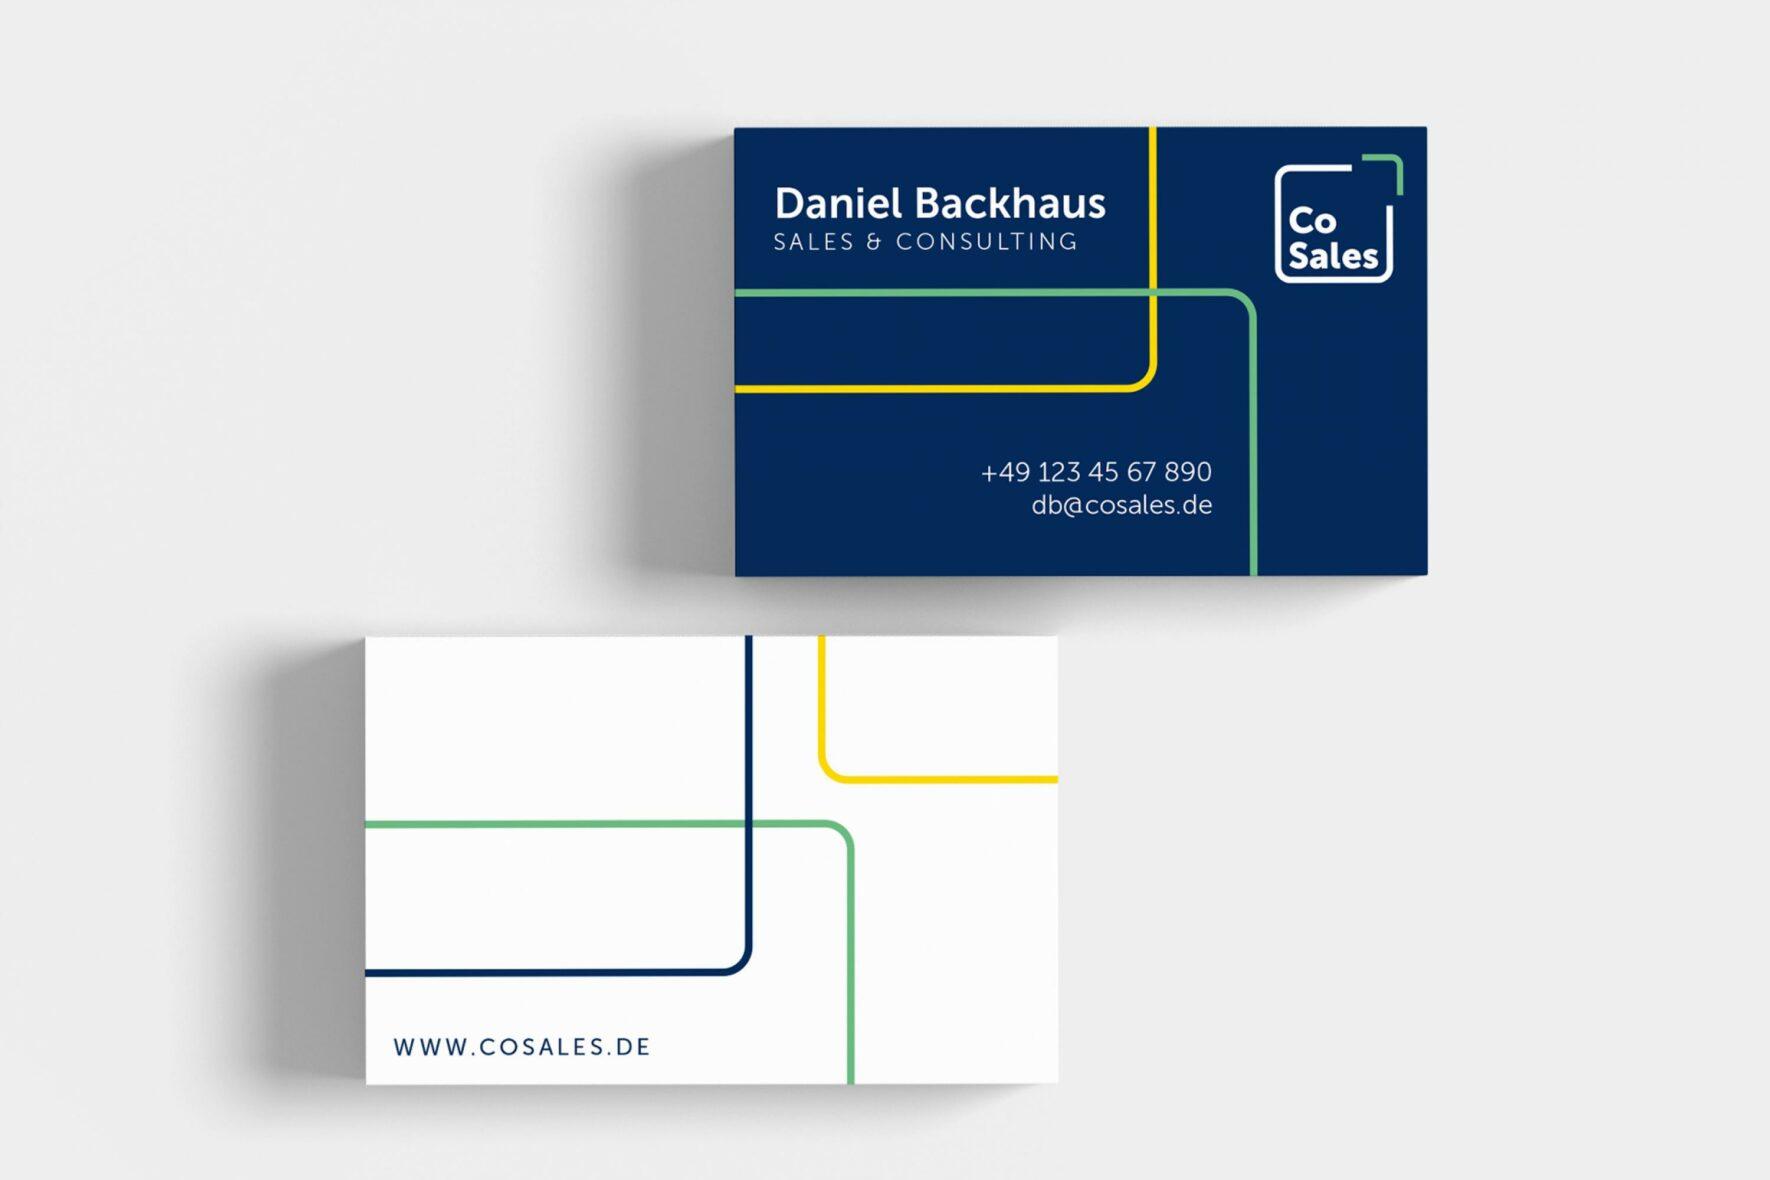 CoSales-Visitenkarten-Gestaltung-Corporate-Design-Print-FORMLOS-Berlin-3